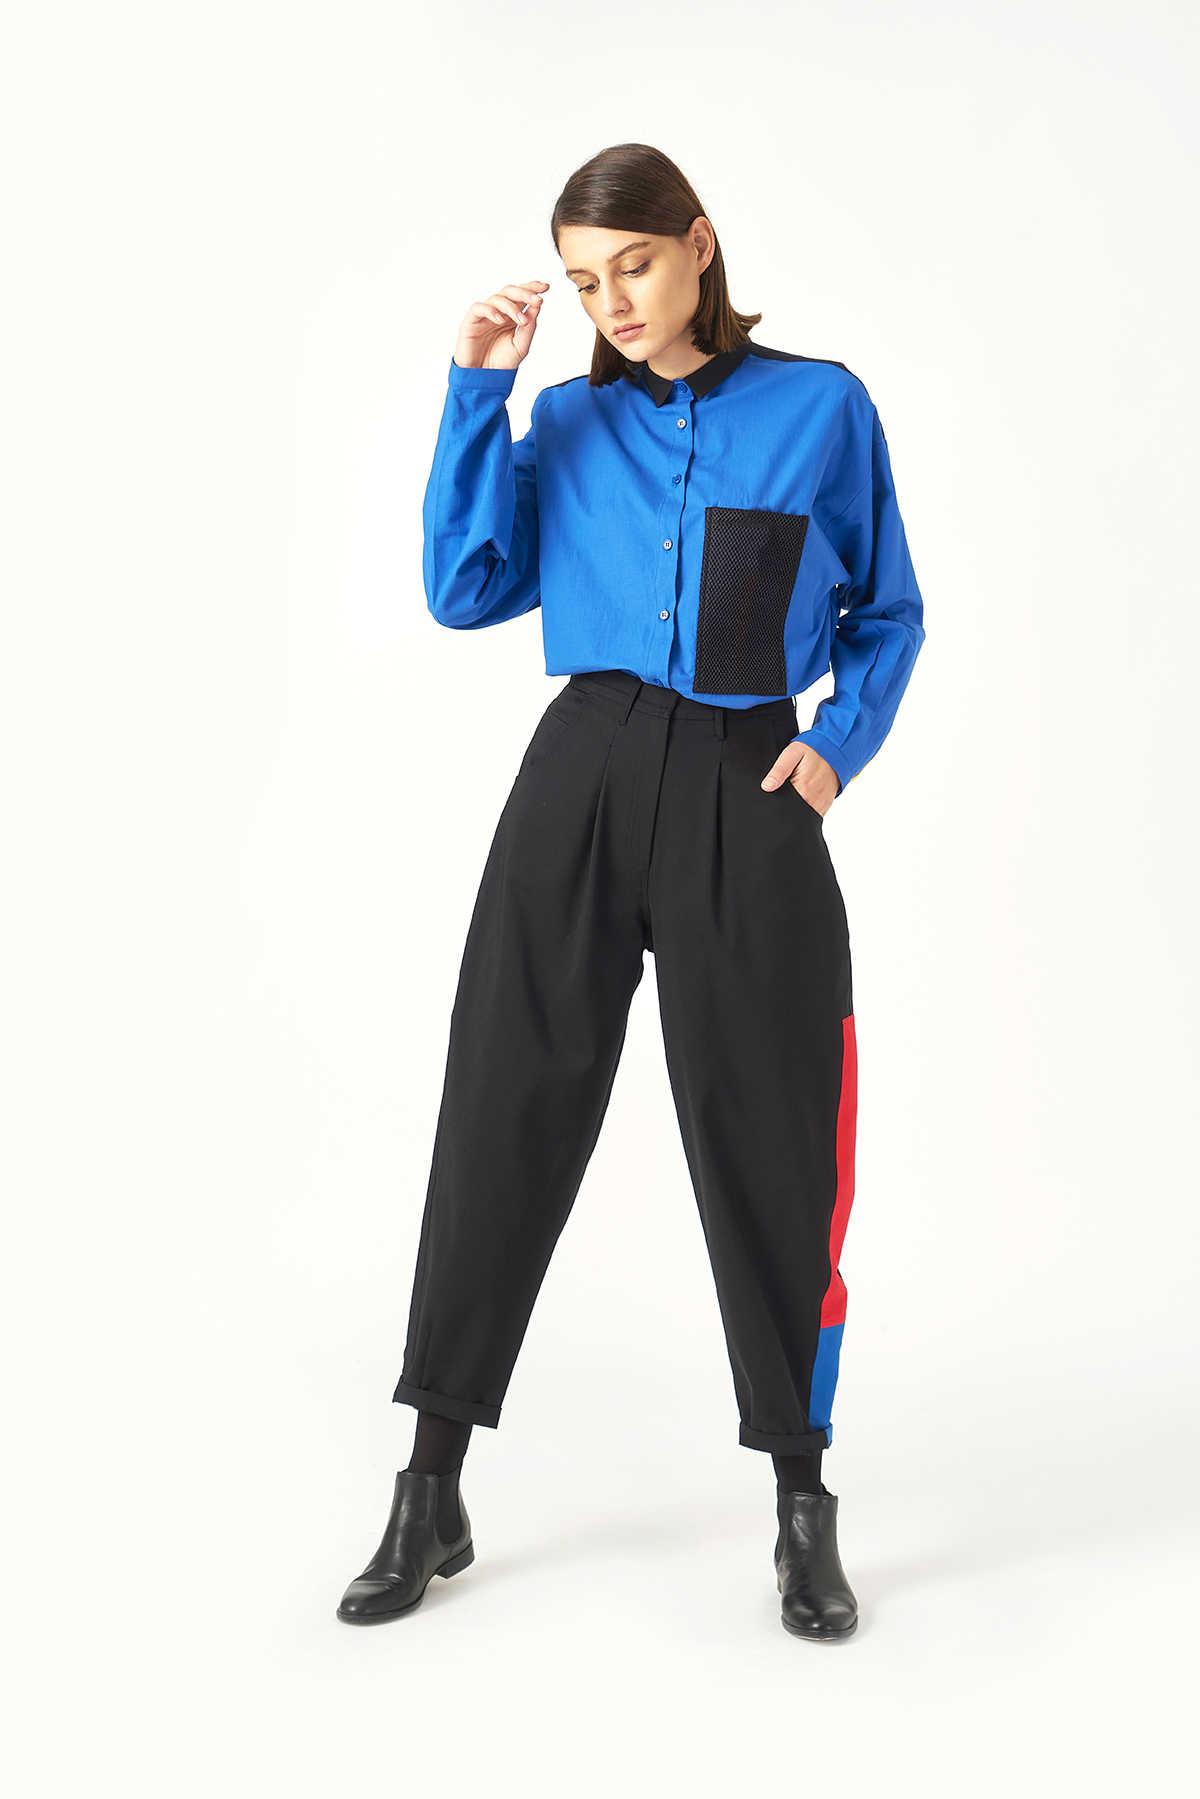 Kuaybe Gider Siyah Kadın Pantolon 4070